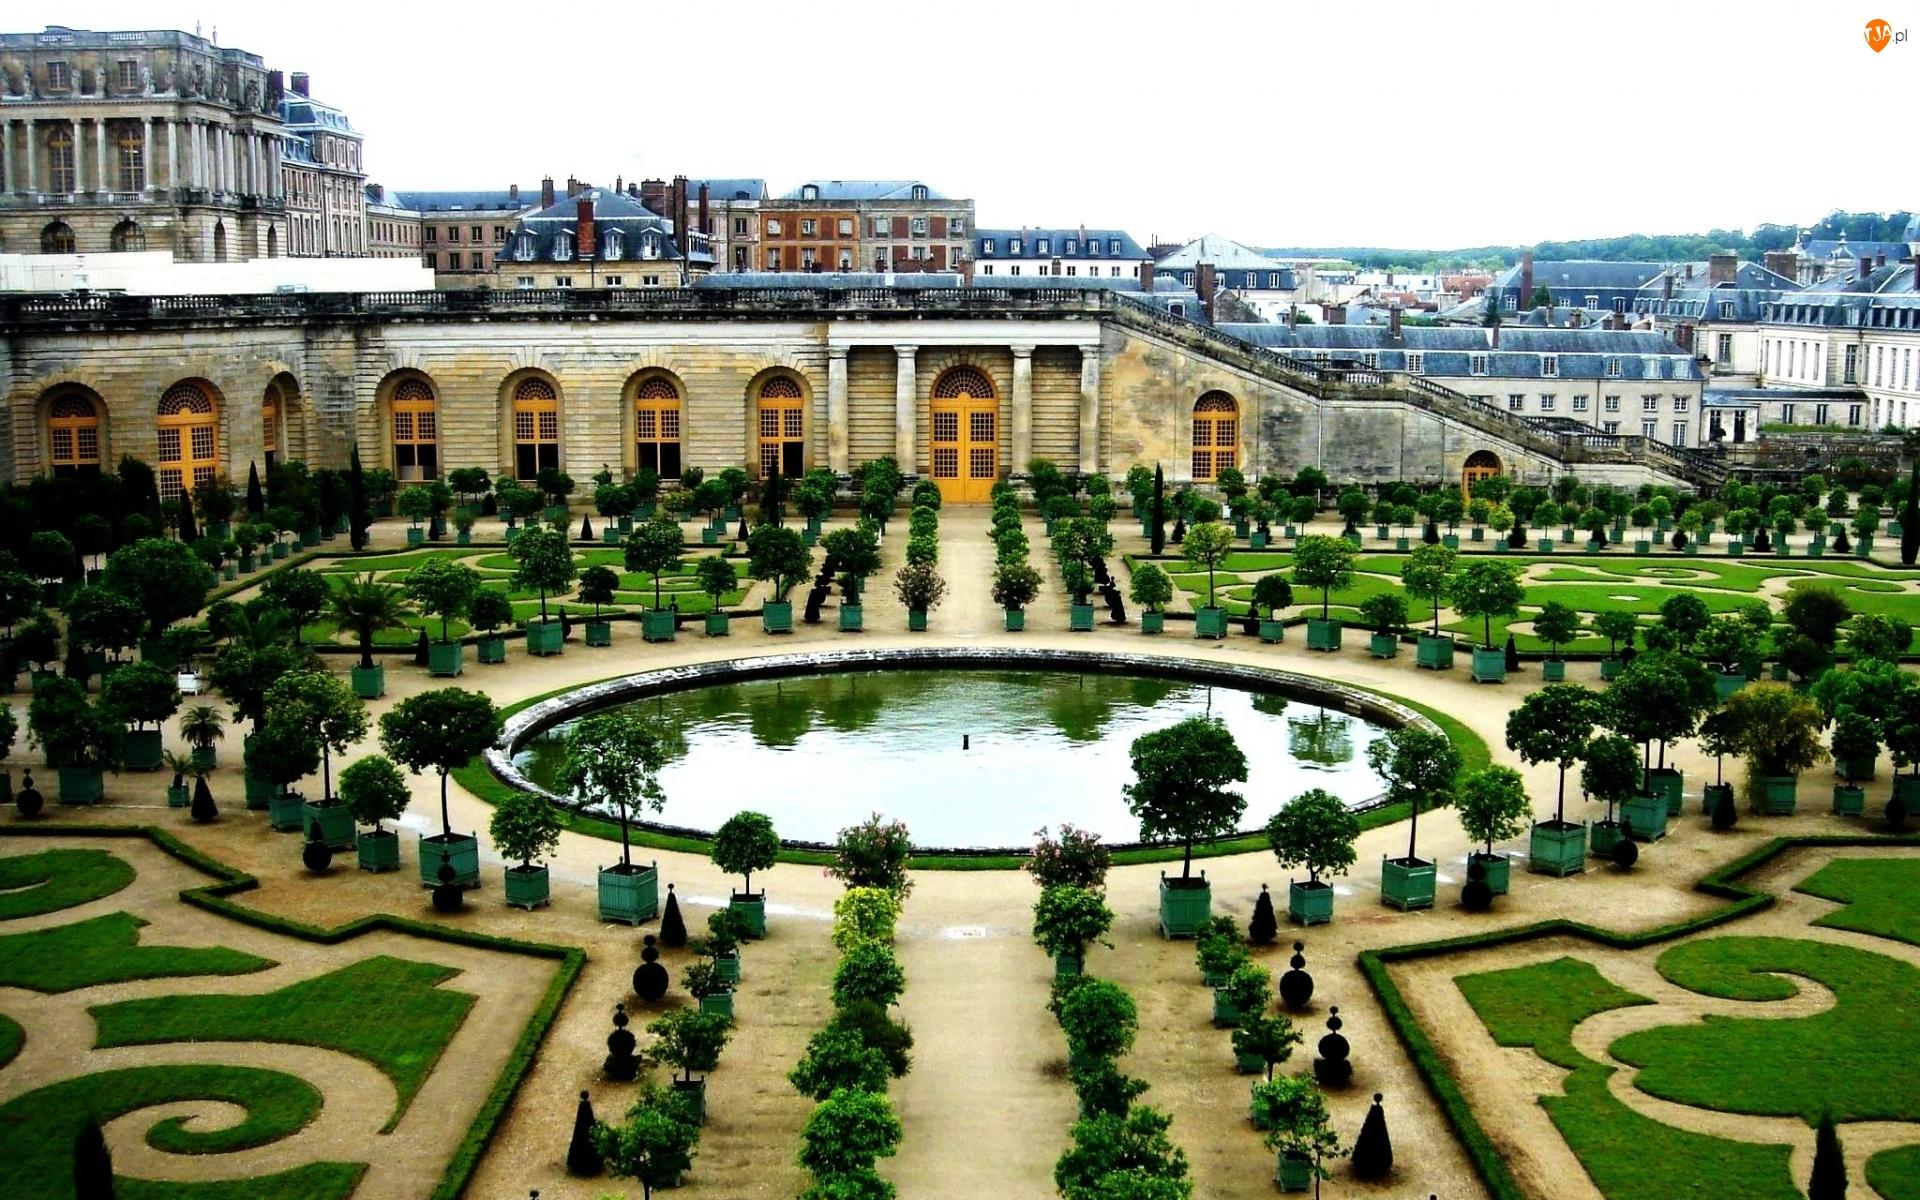 Ogród, Francja, Wersal